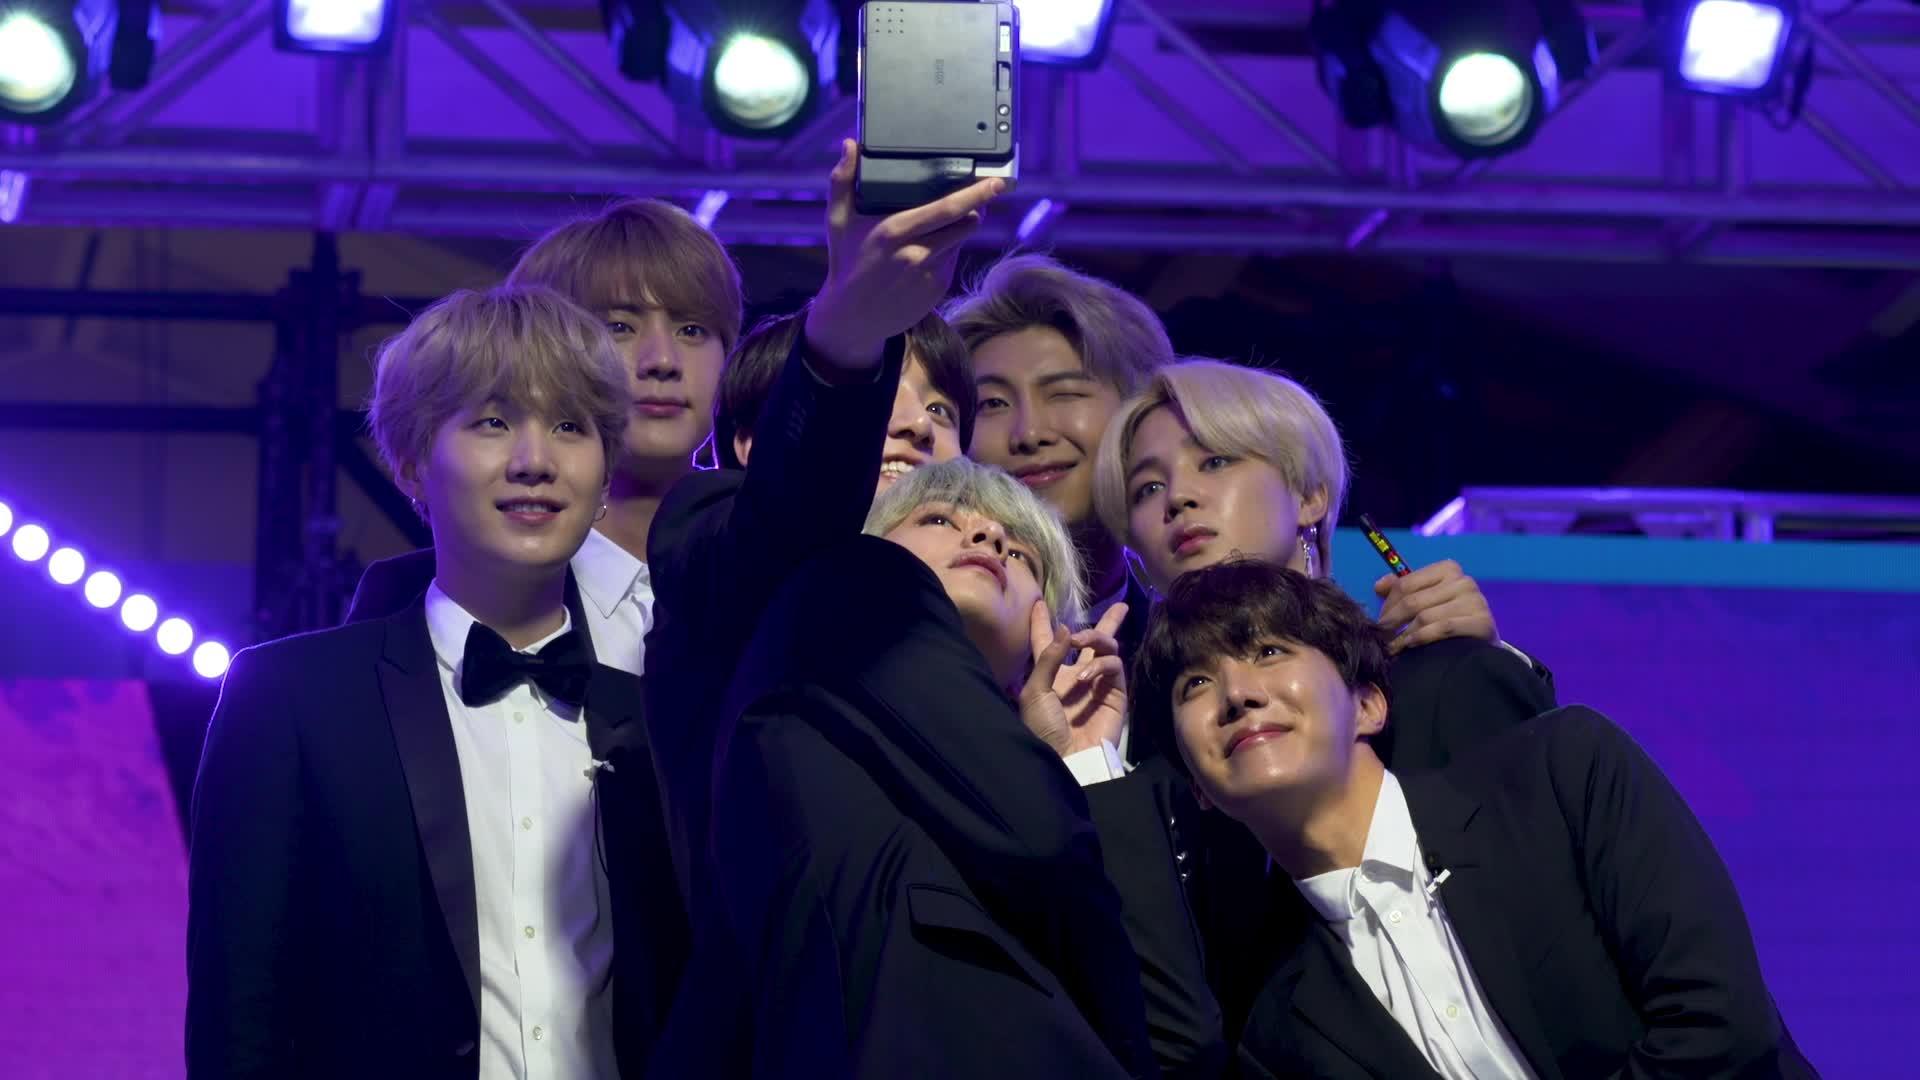 BTS 리멤버파티 시상식 메이킹 [re:memVer again] / 2019 GLOBAL VLIVE TOP 10